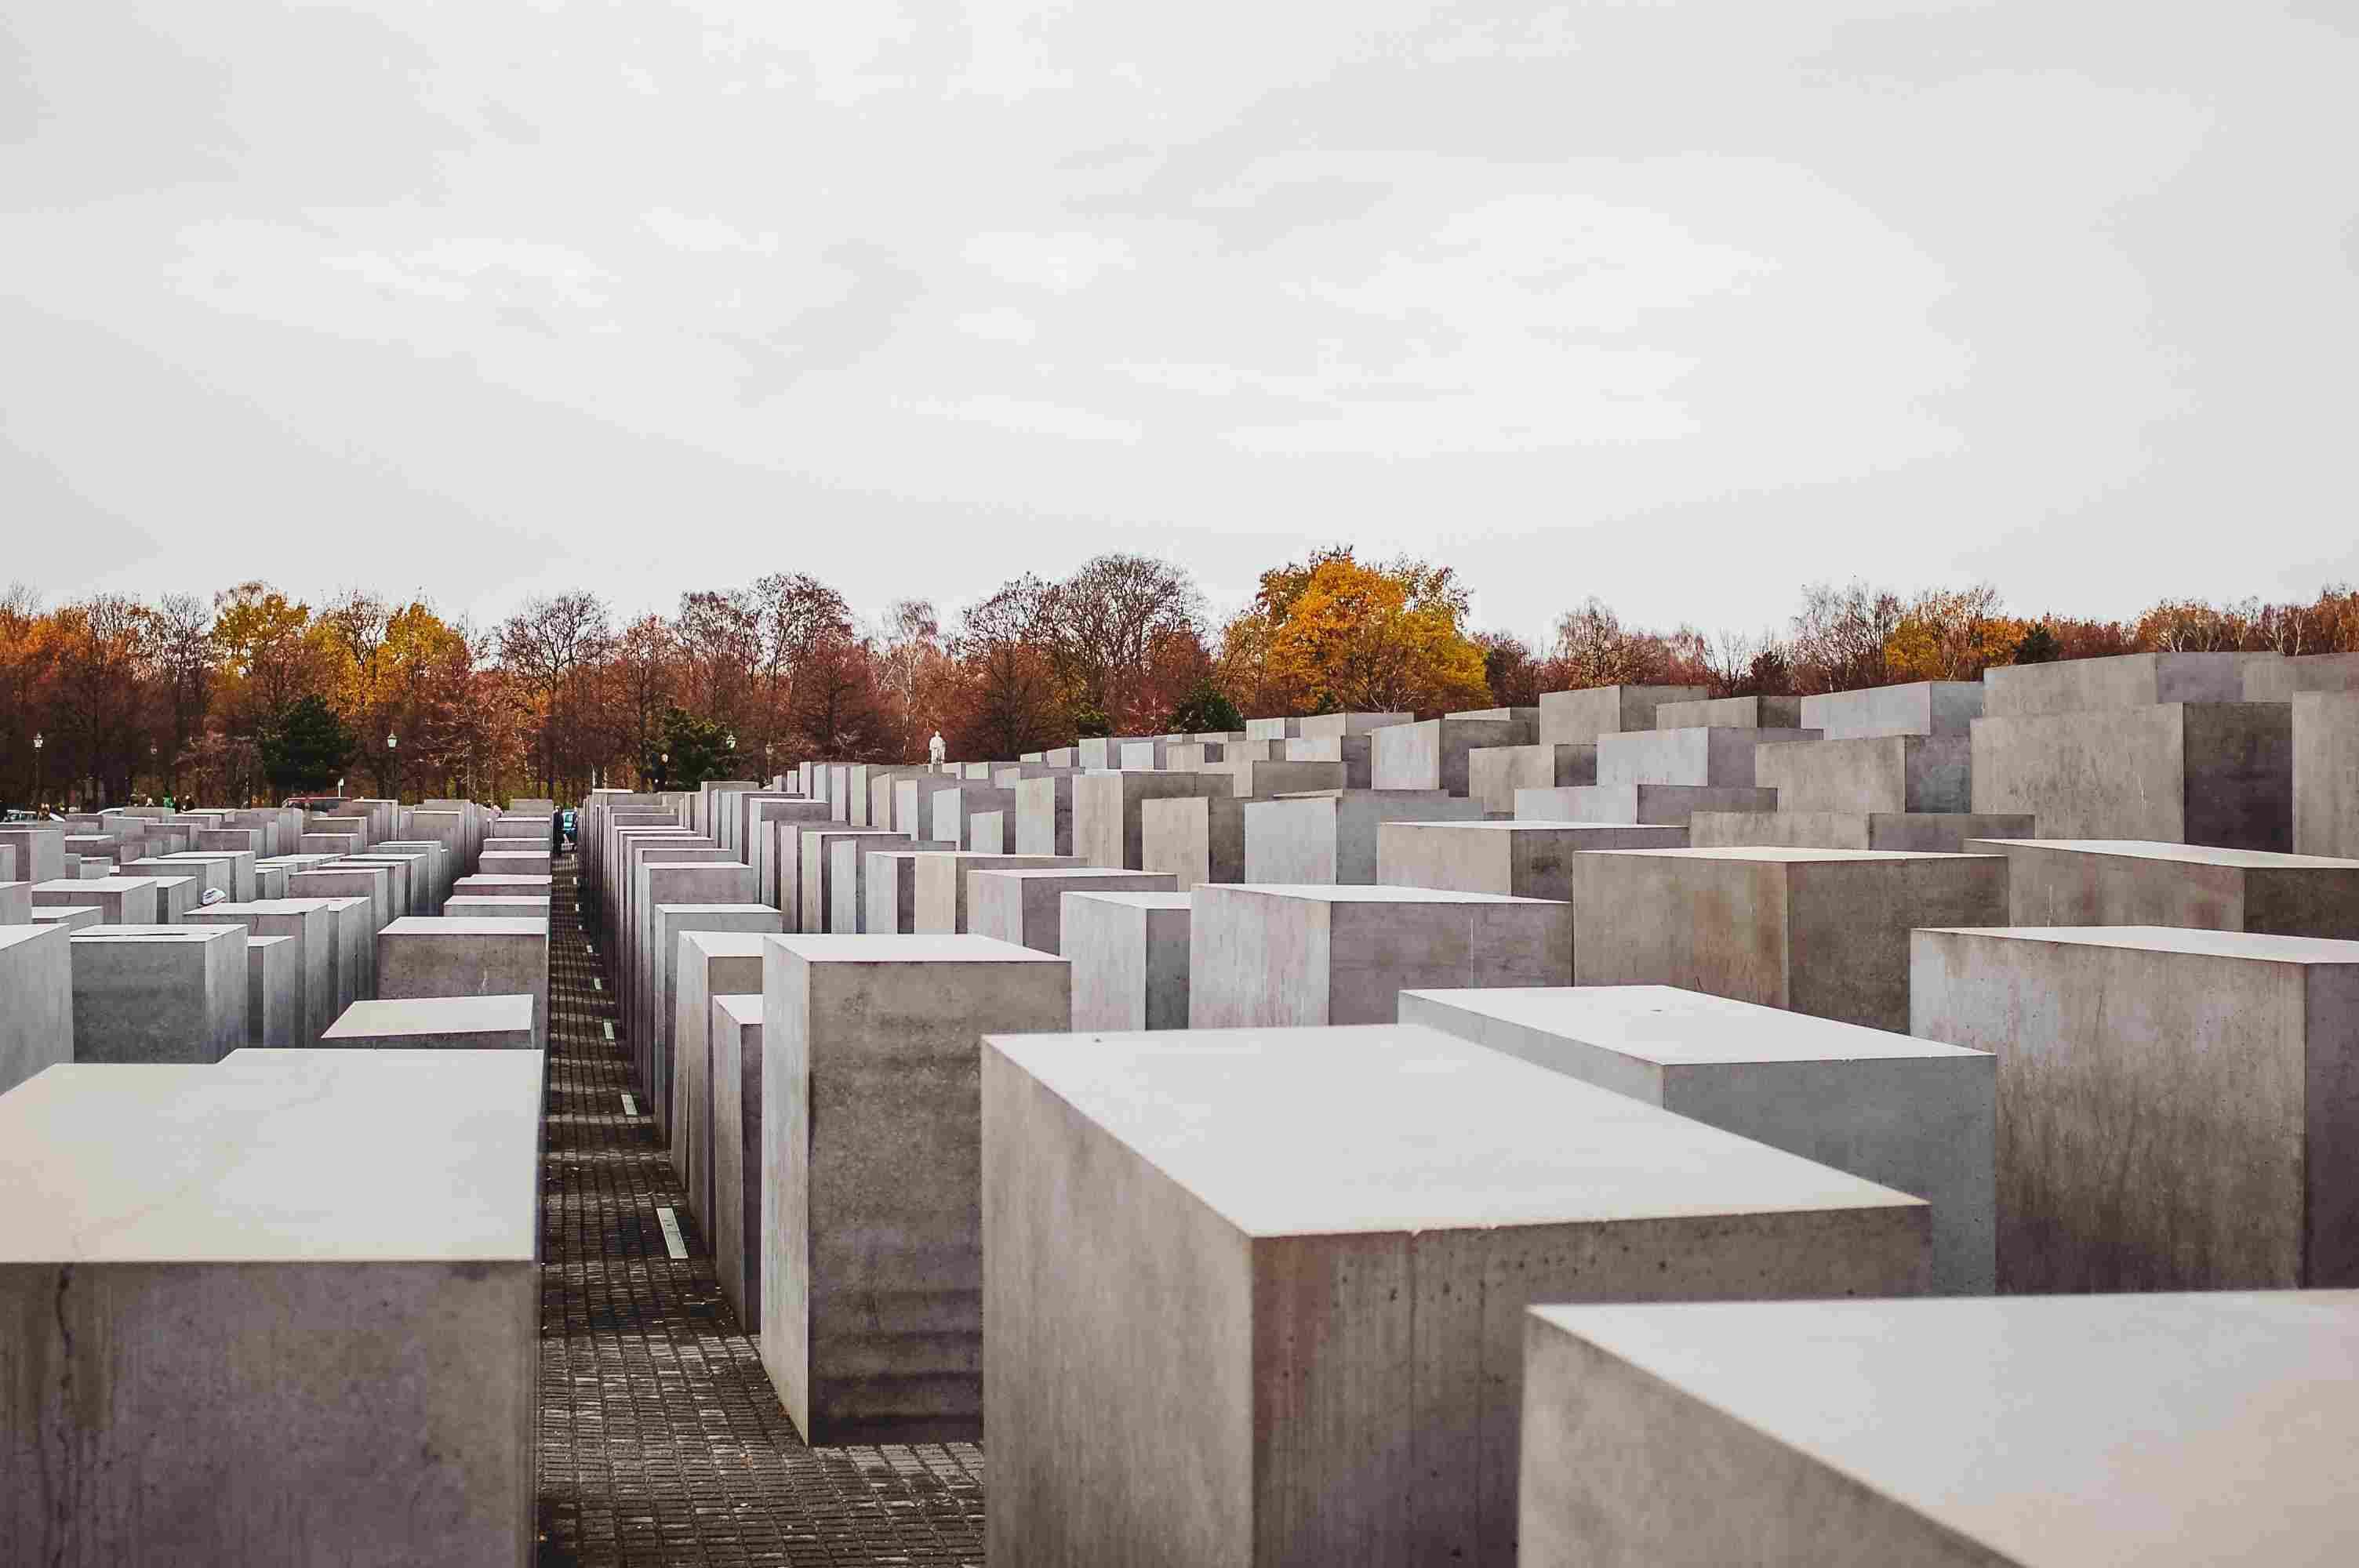 Holocaust Memorials in Germany